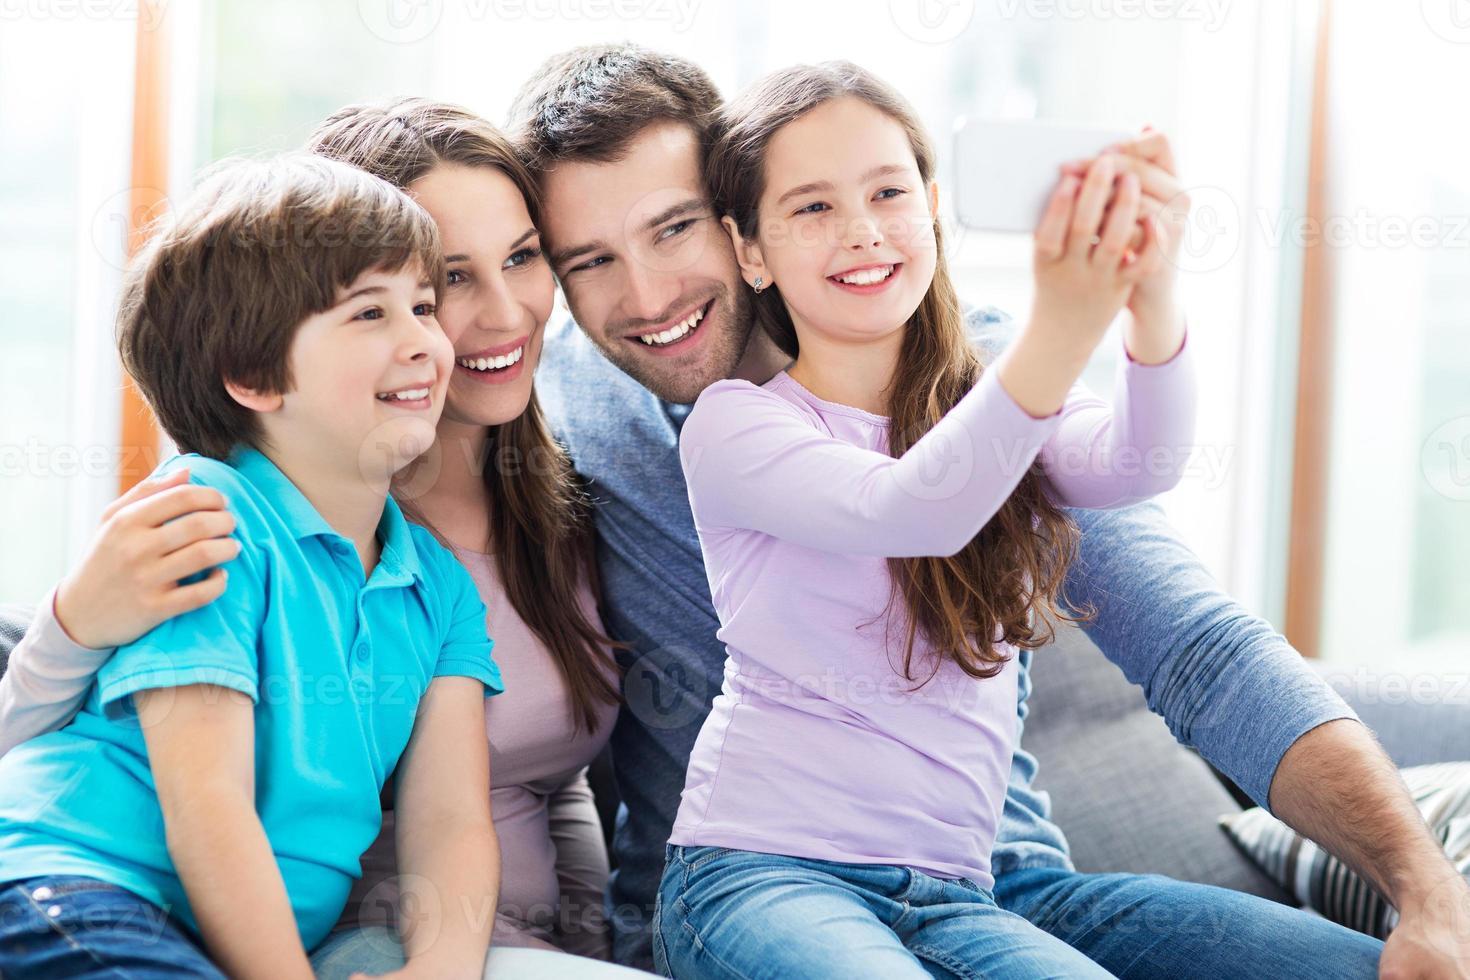 família tirando foto de si mesmo